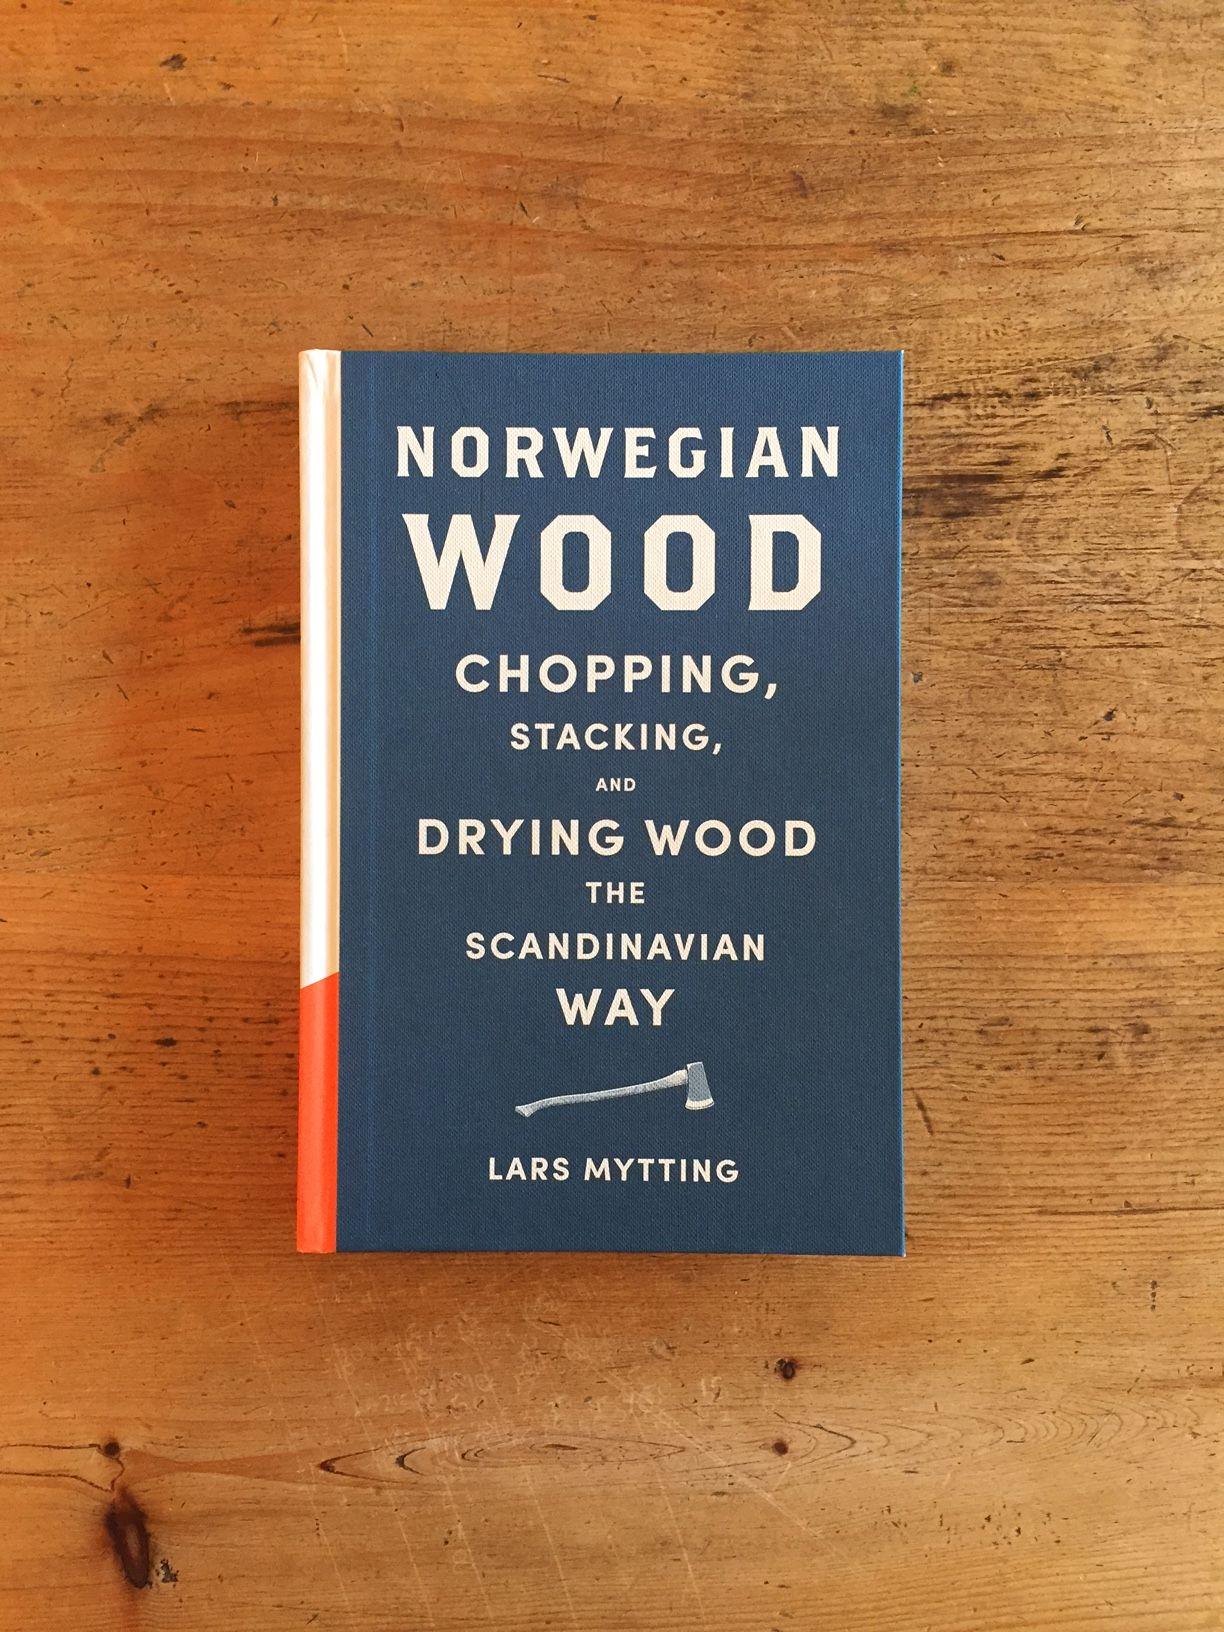 Norwegian Wood Chopping Stacking And Drying Wood The Scandinavian Way Lars Mytting Norwegian Wood Wood Book Norwegian